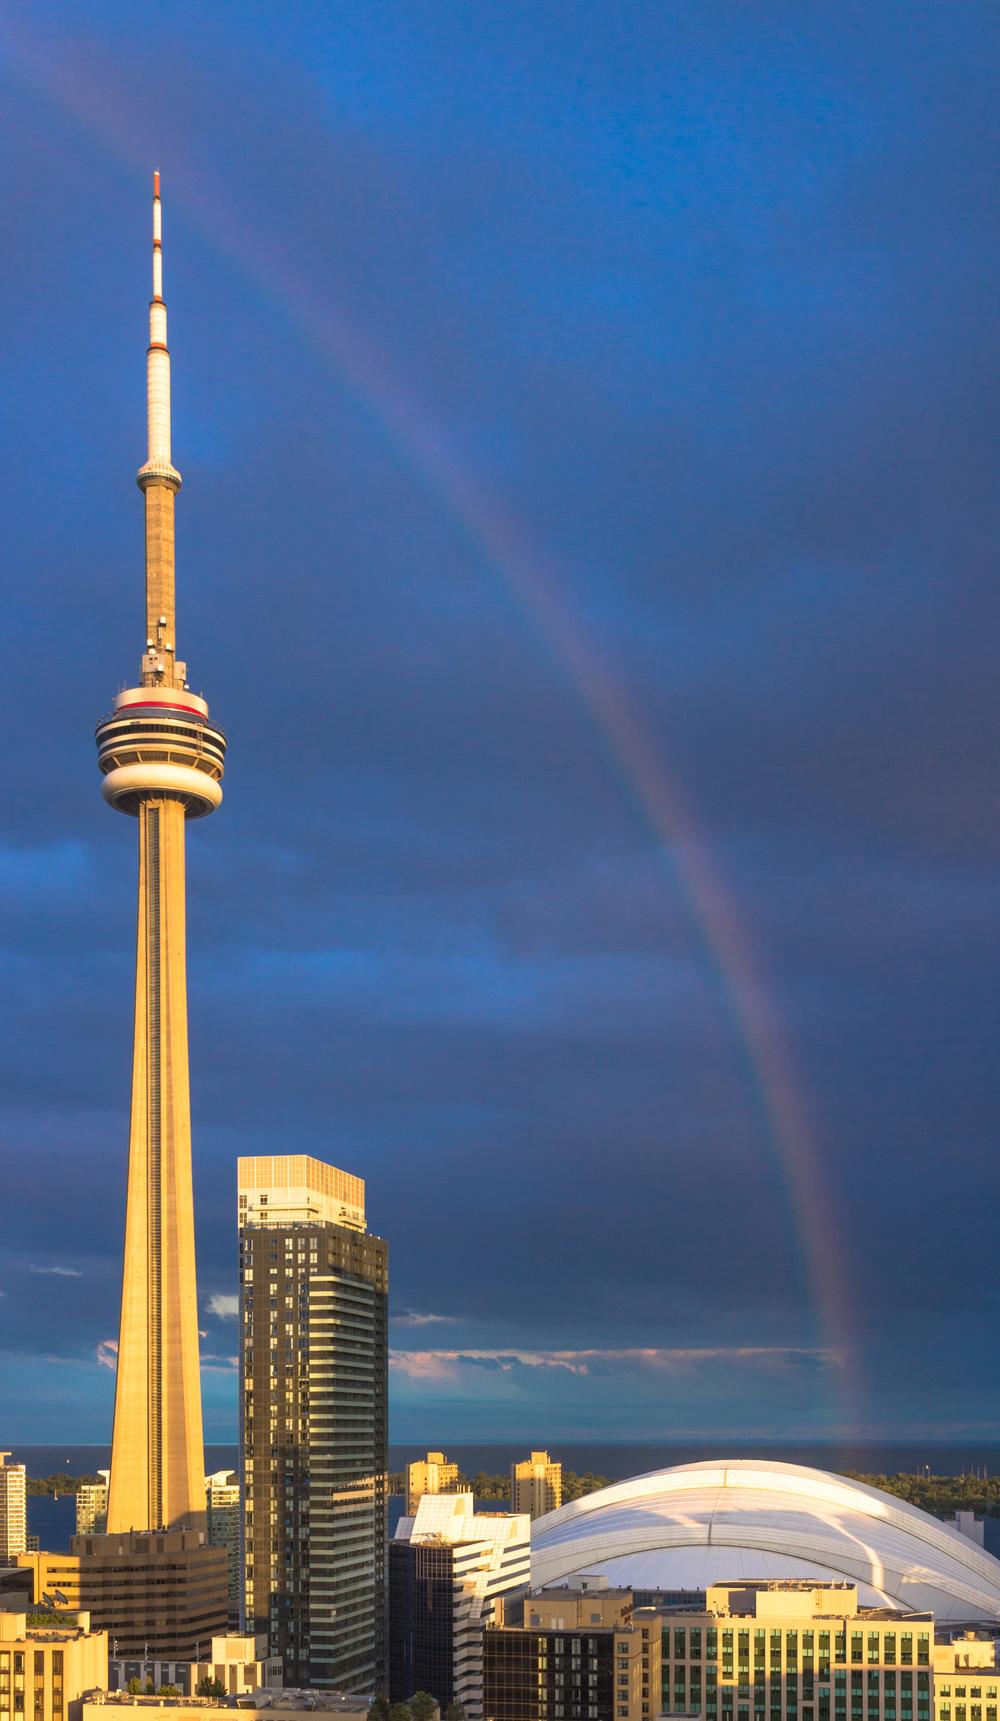 rainbow-1-5.jpg